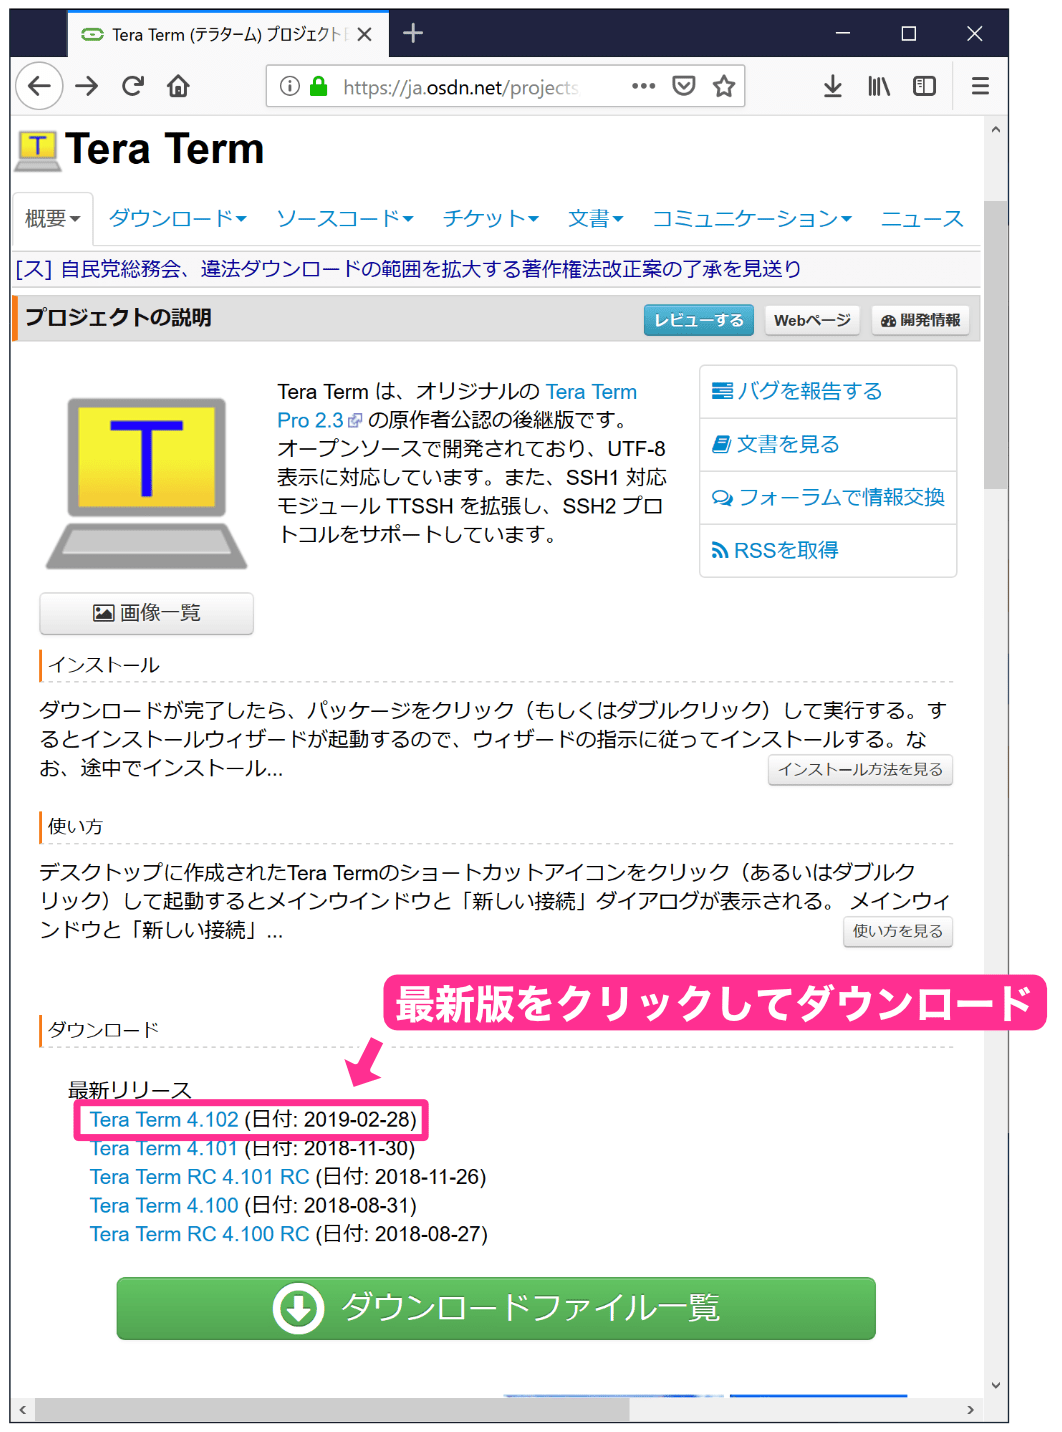 TeraTermダウンロードページ